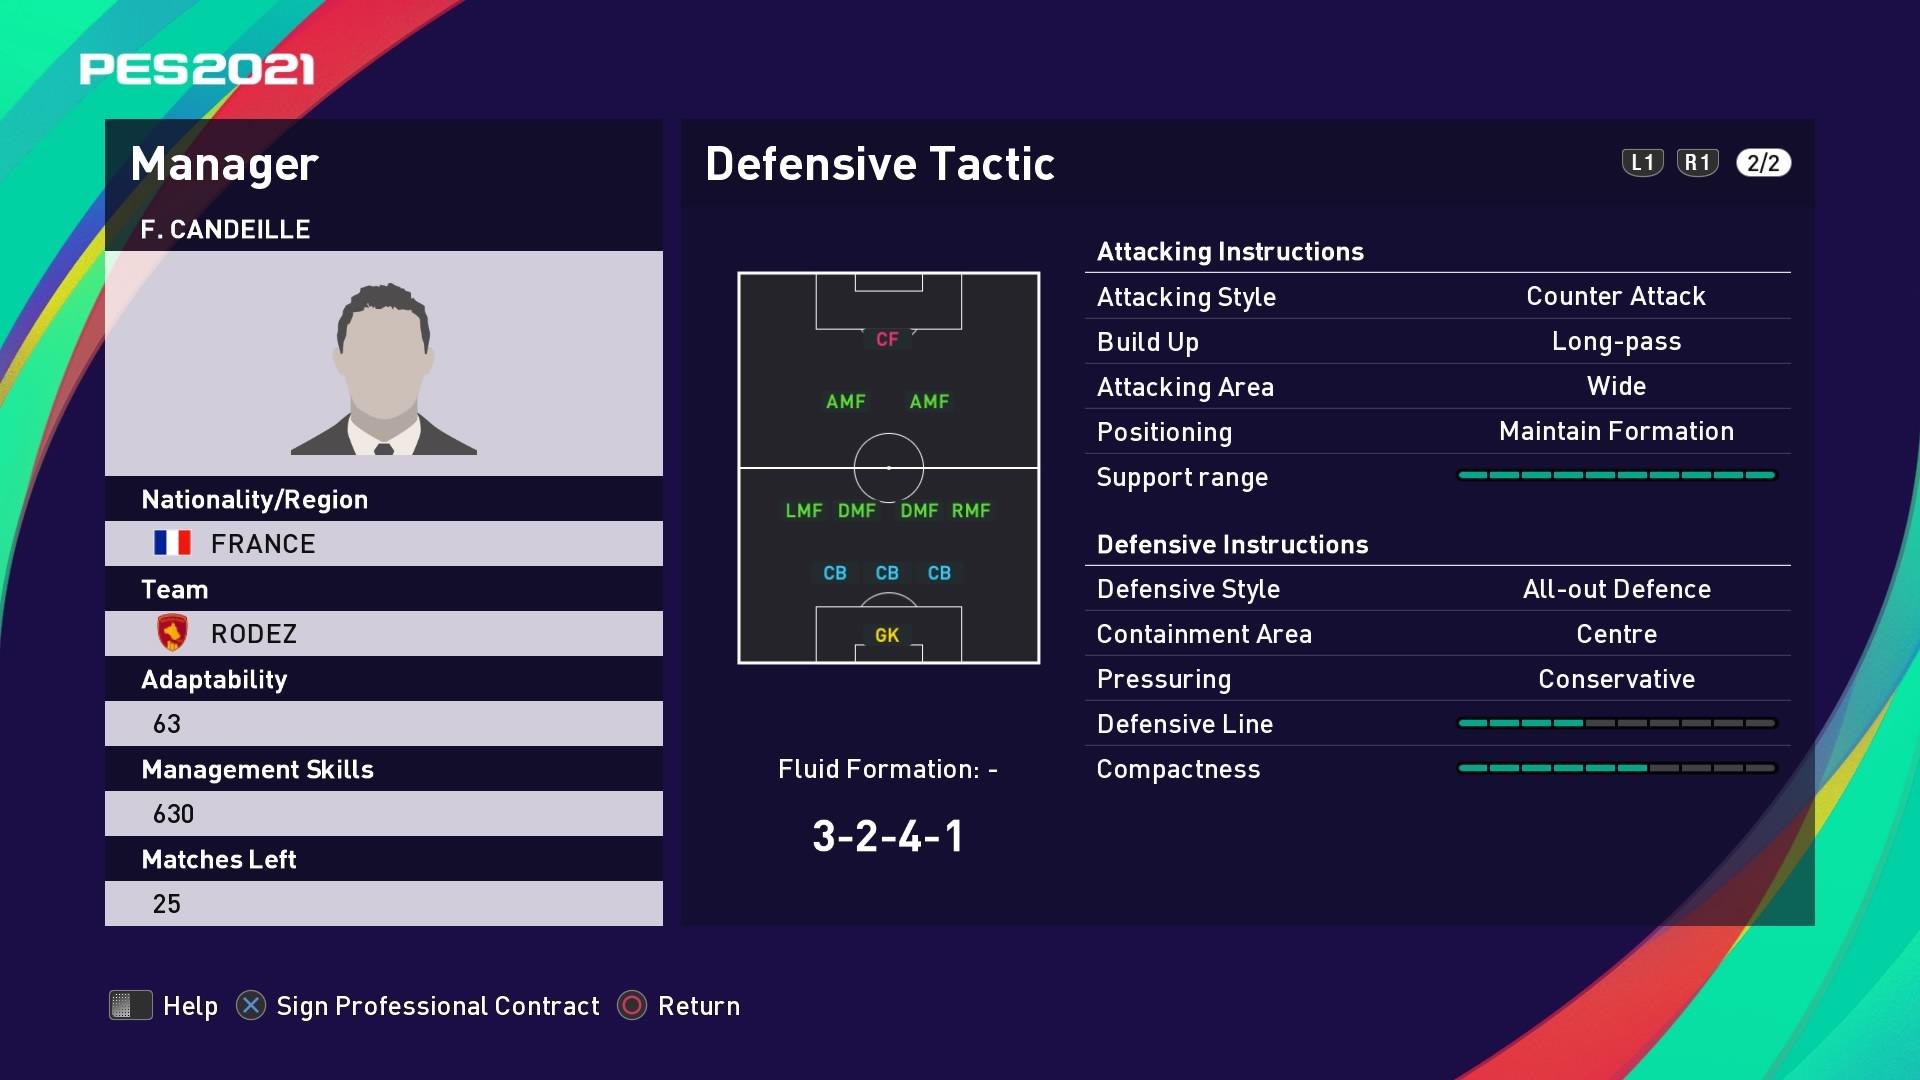 F. Candeille (Laurent Peyrelade) Defensive Tactic in PES 2021 myClub